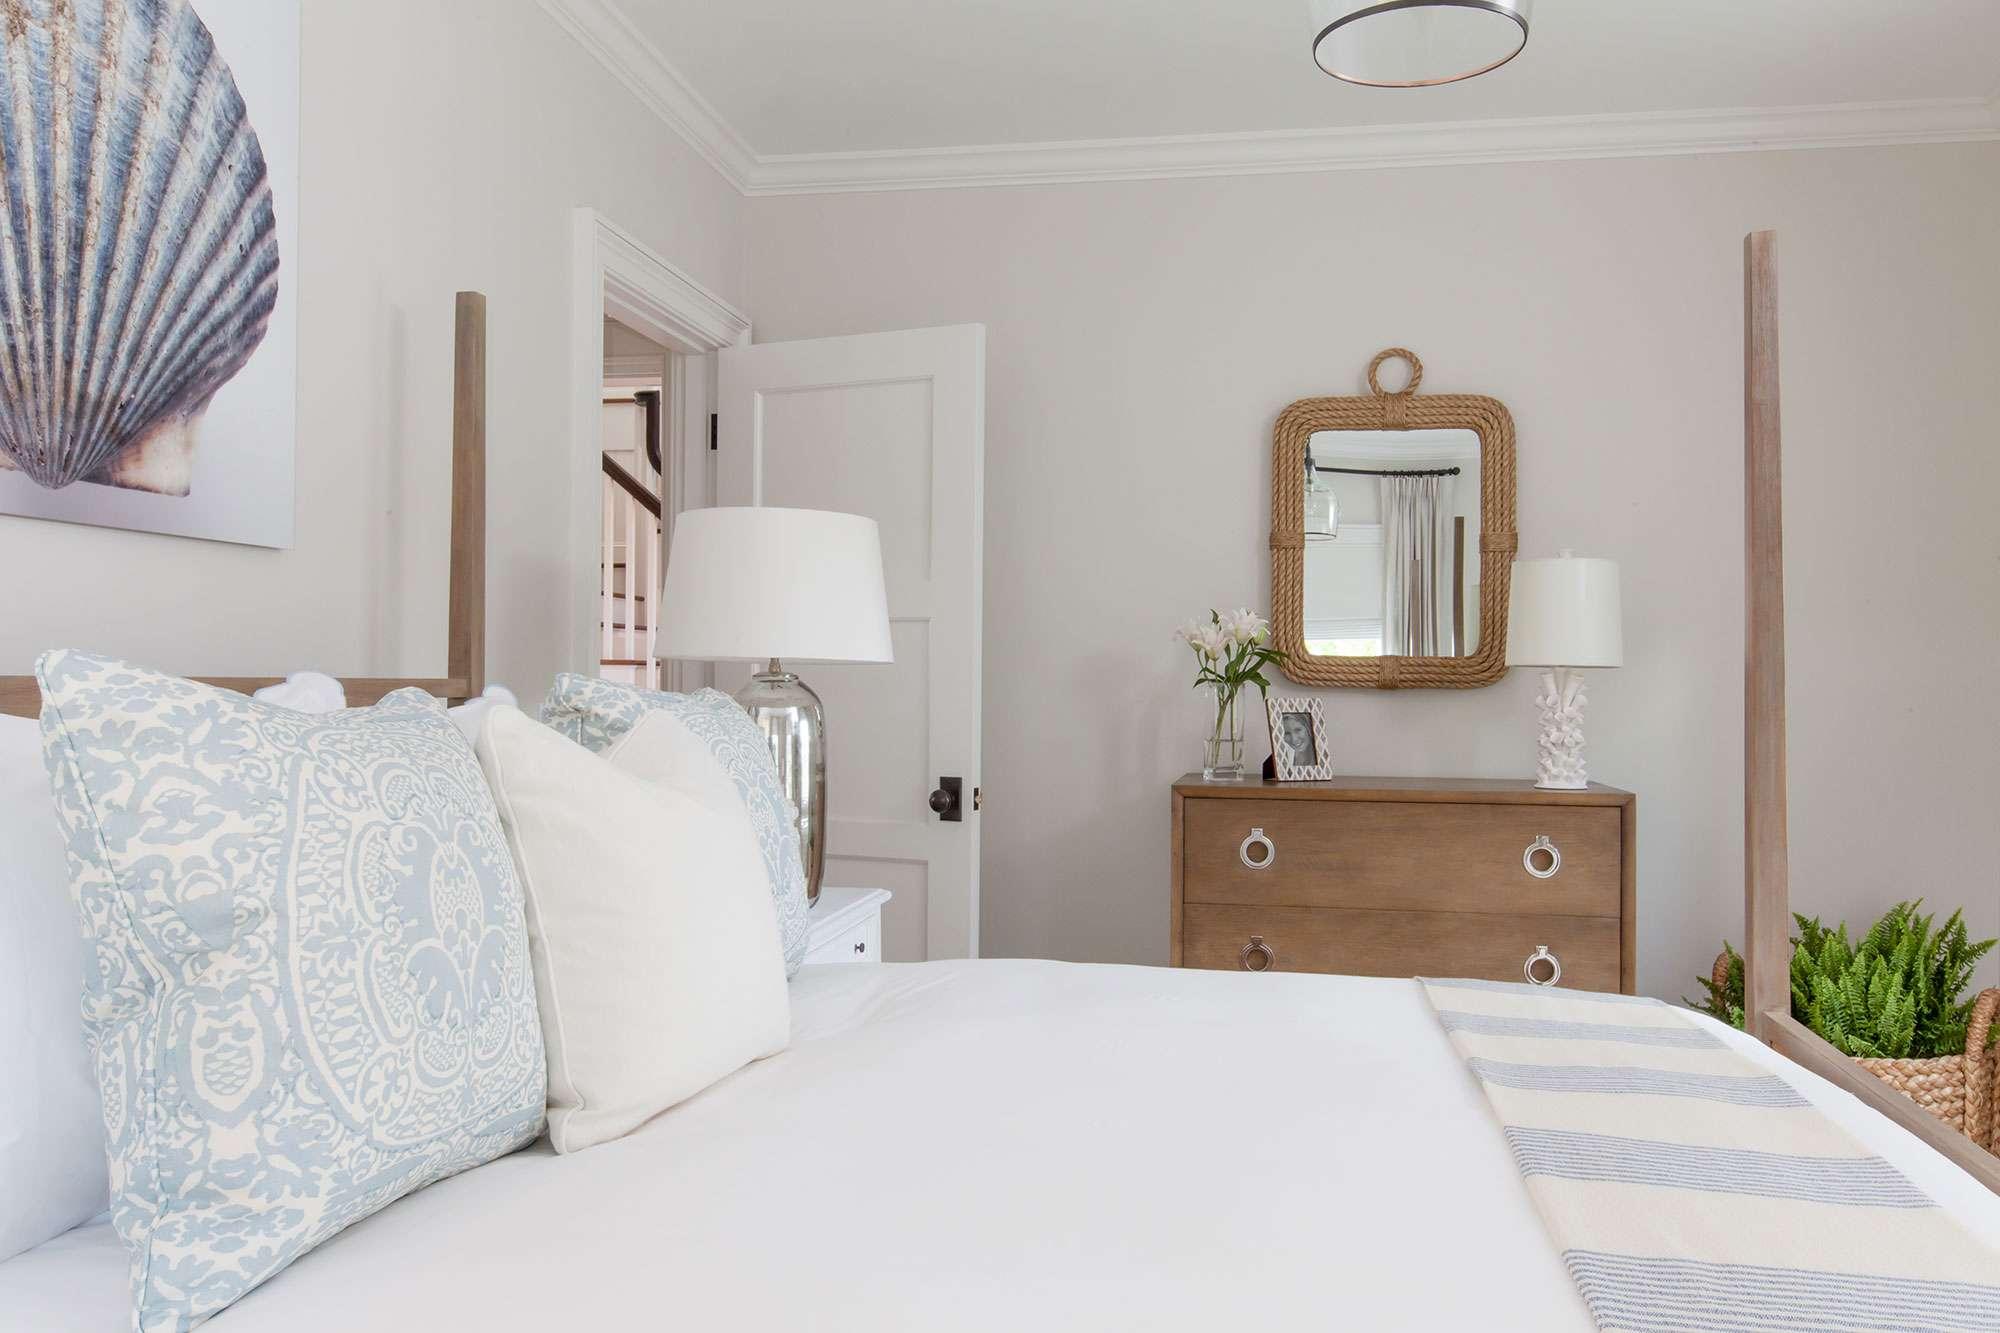 Nantucket bedroom example of coastal decor